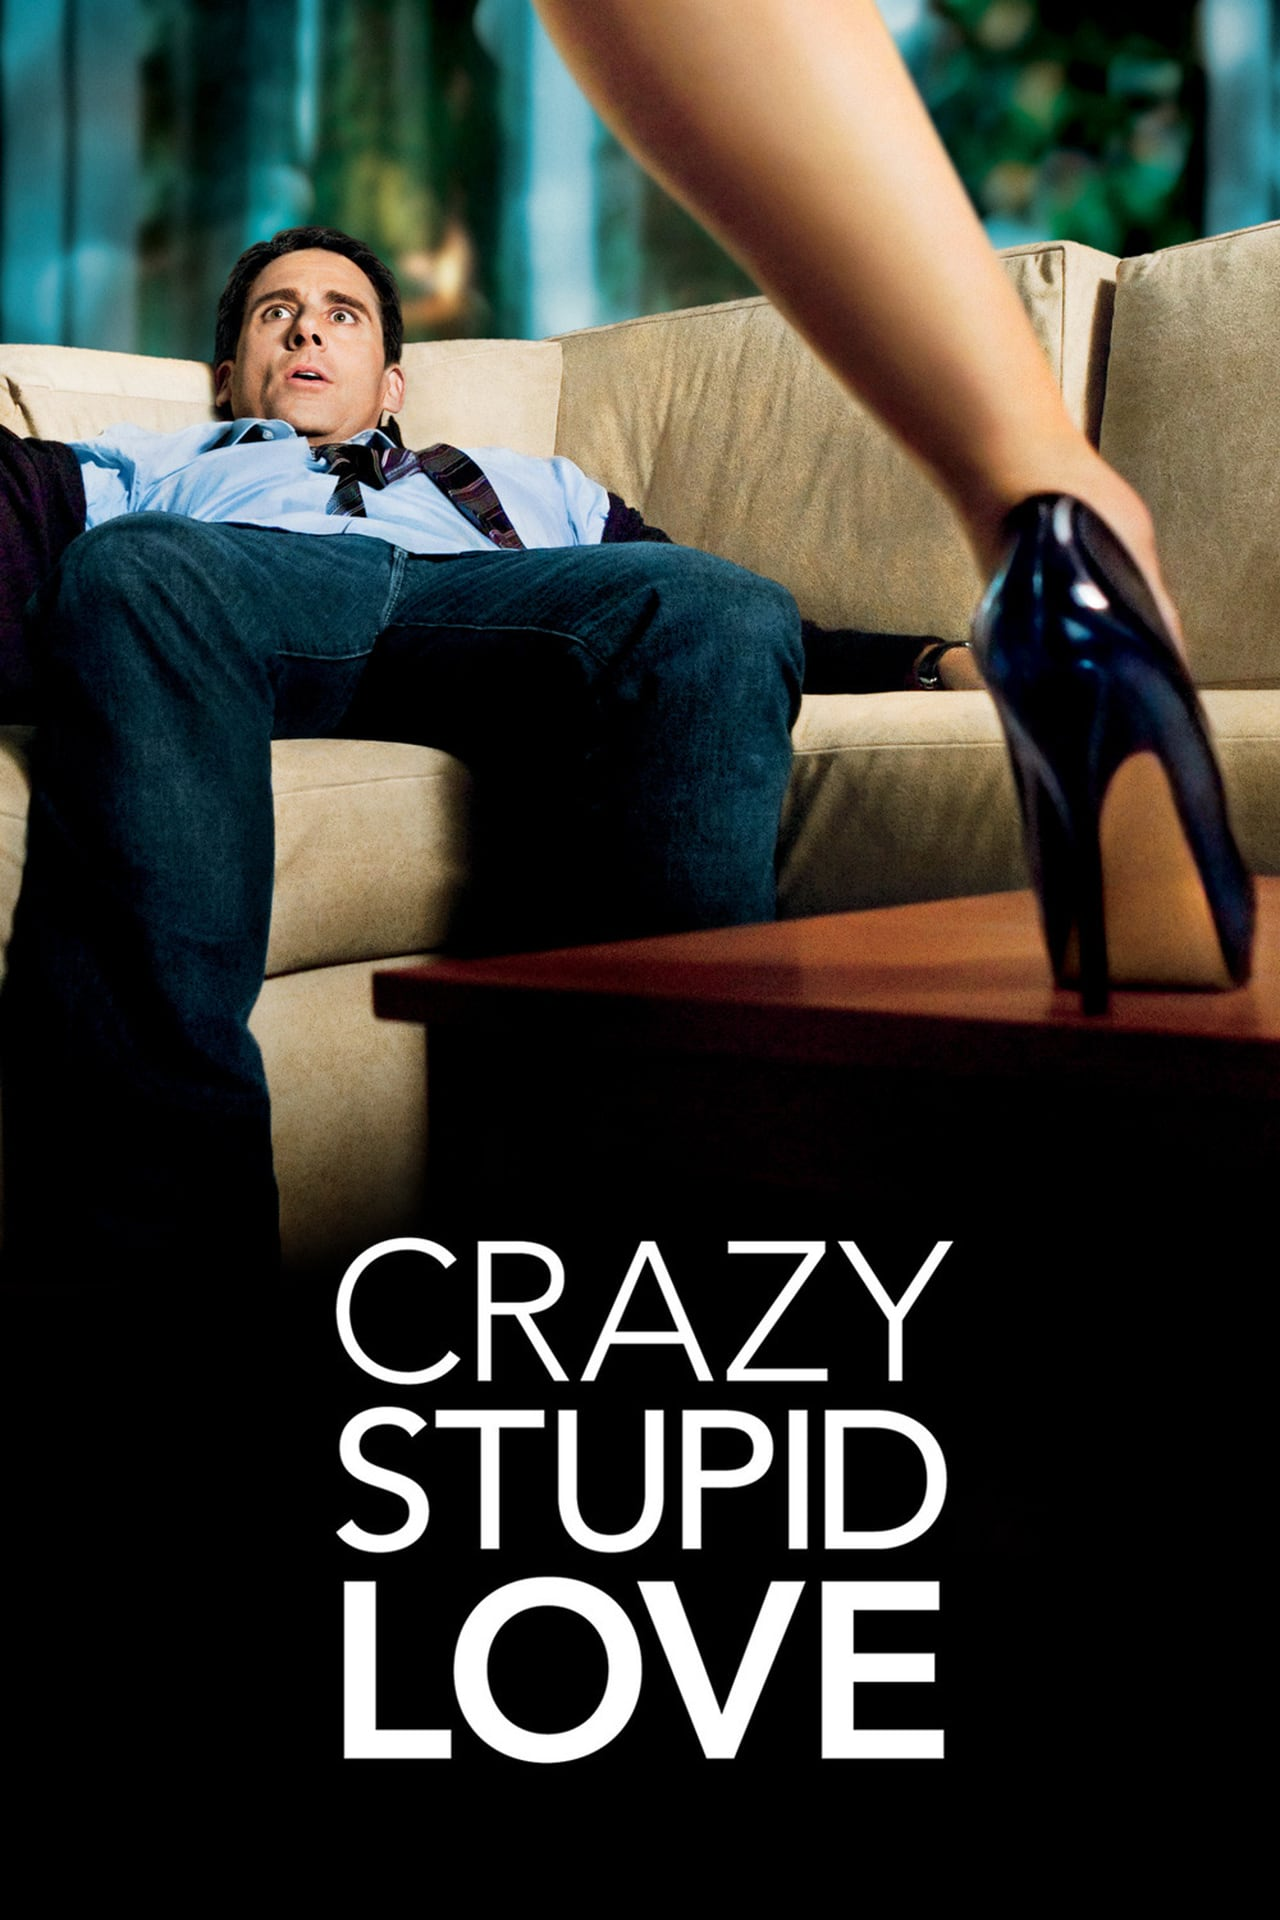 Crazy, Stupid, Love. by John Requa